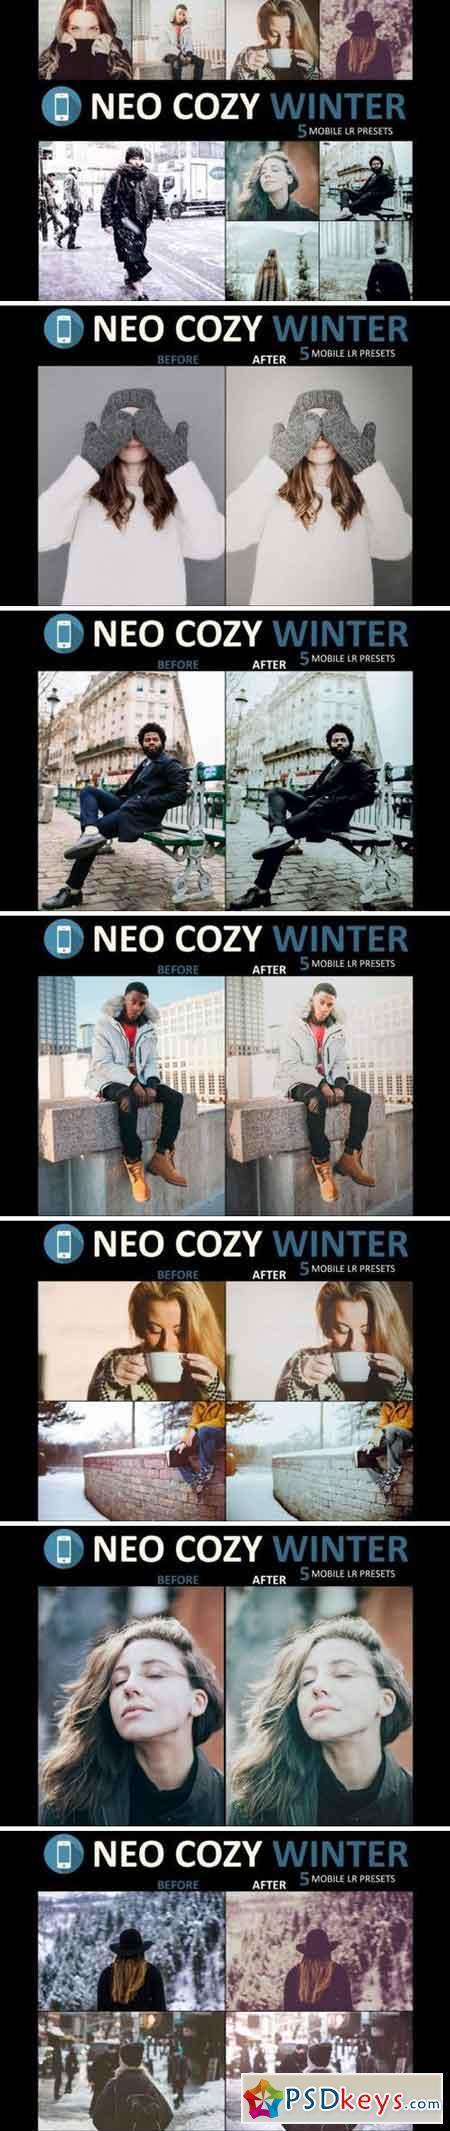 Neo Cozy Winter mobile lightroom presets